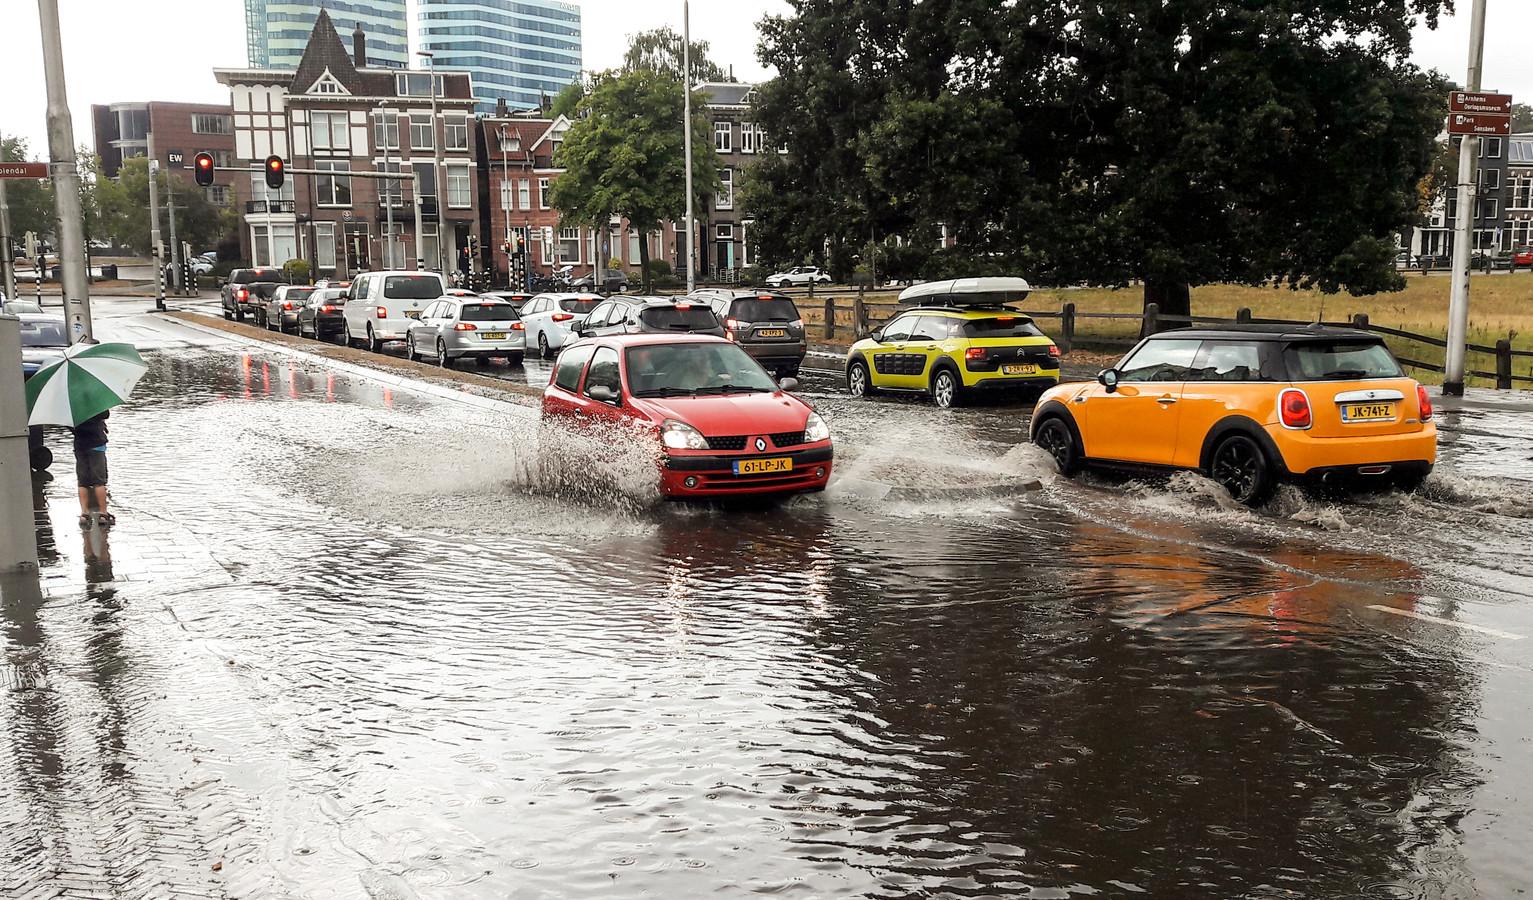 Indammen Wateroverlast Door Hoosbui In Arnhem Werpt Vruchten